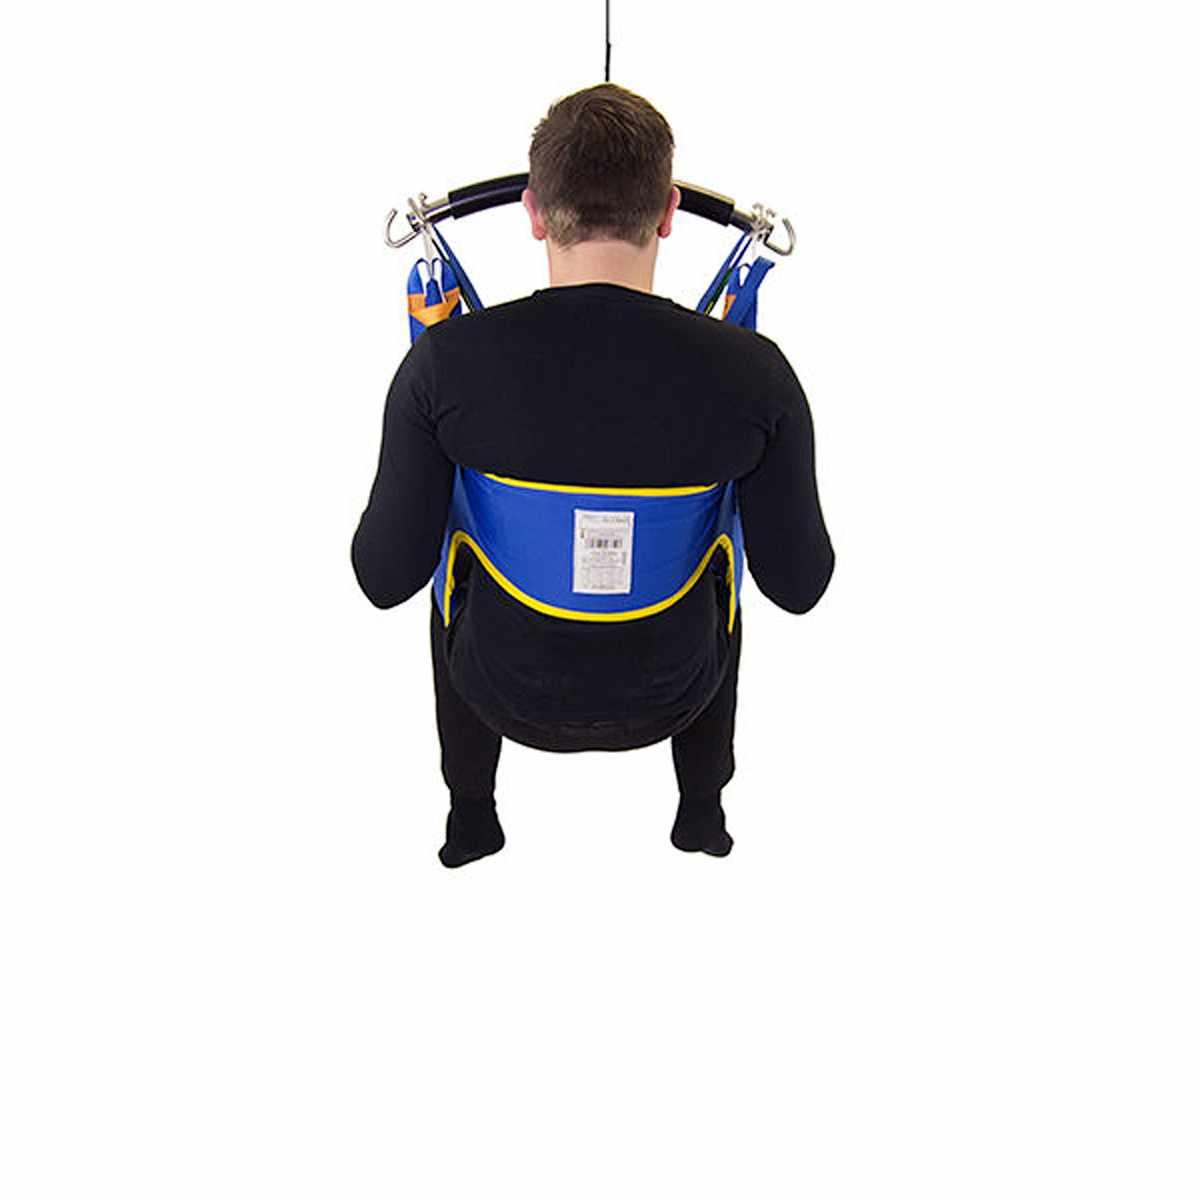 Prism Medical Dual Access Poly Sling - Back Side